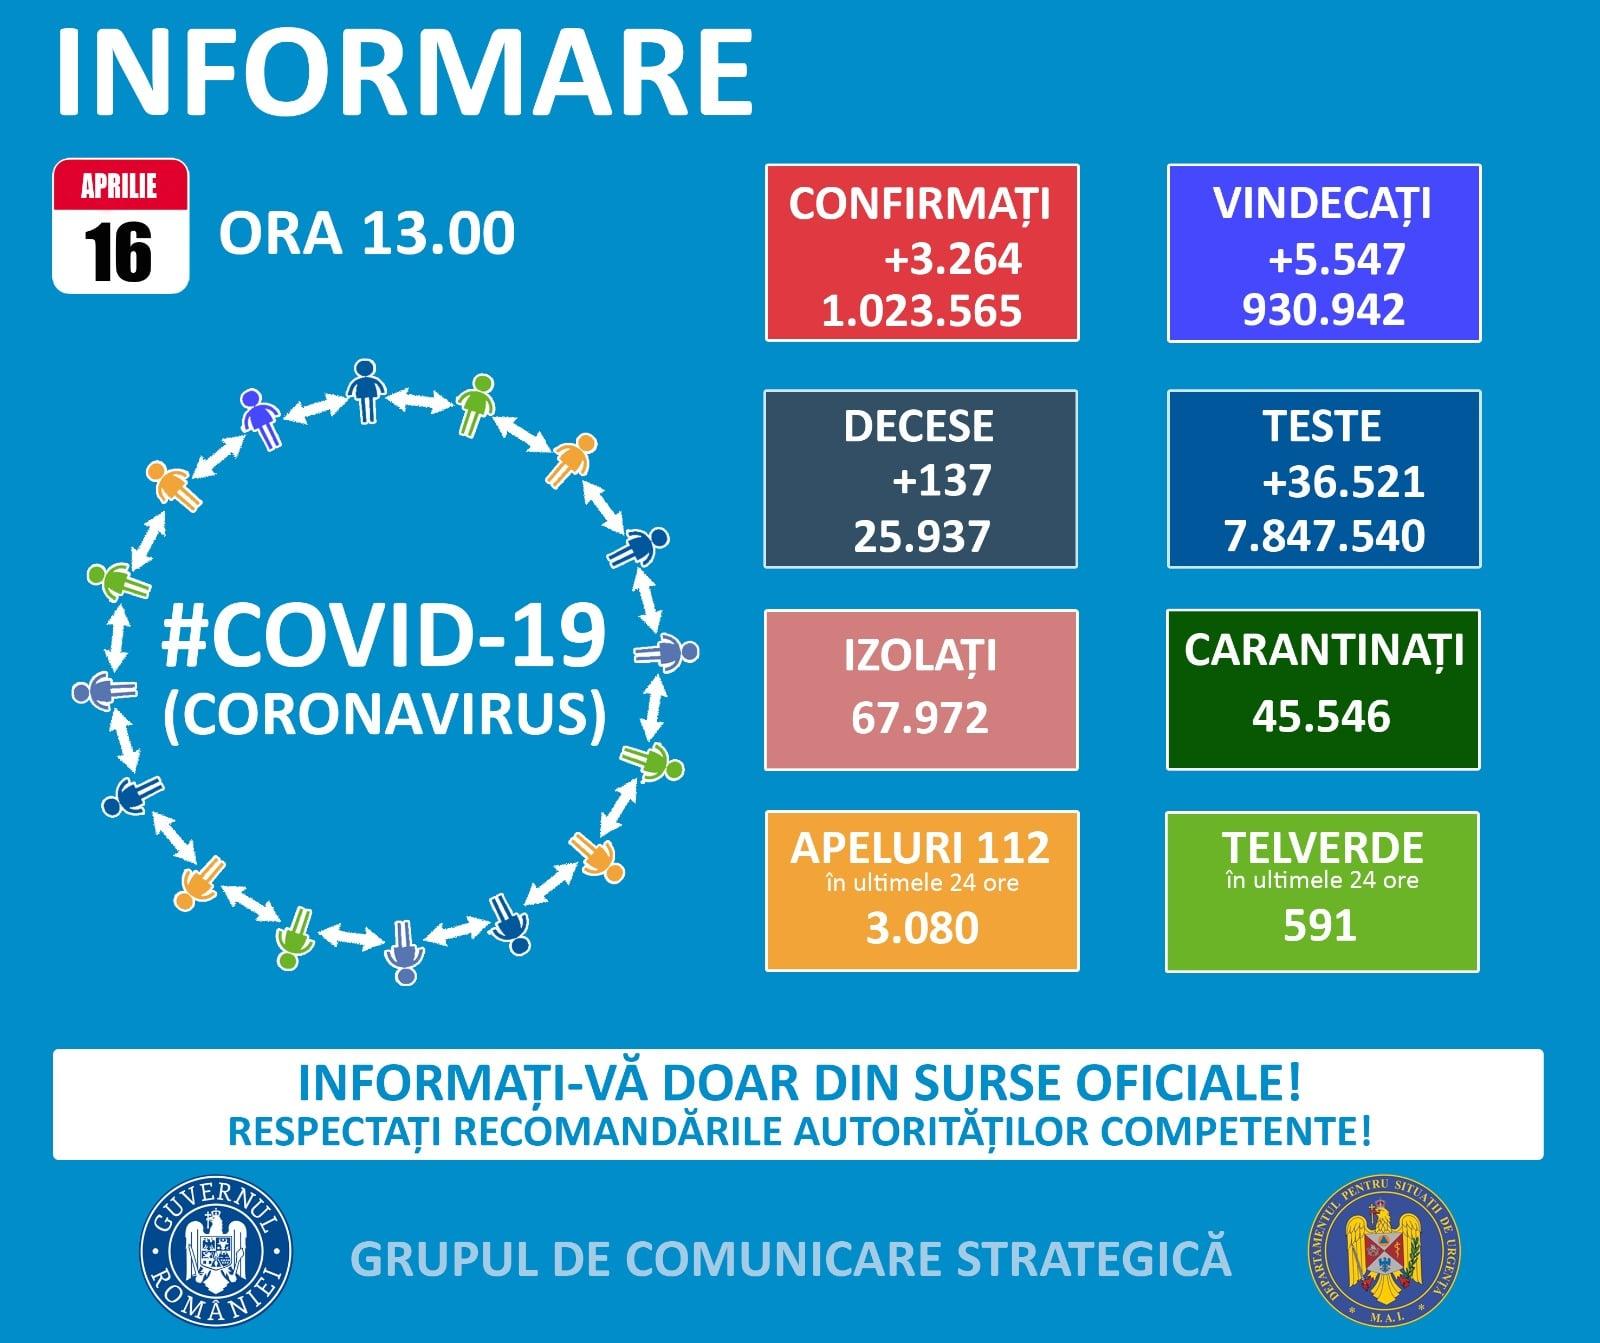 Informare COVID-19, 16 aprilie 2021